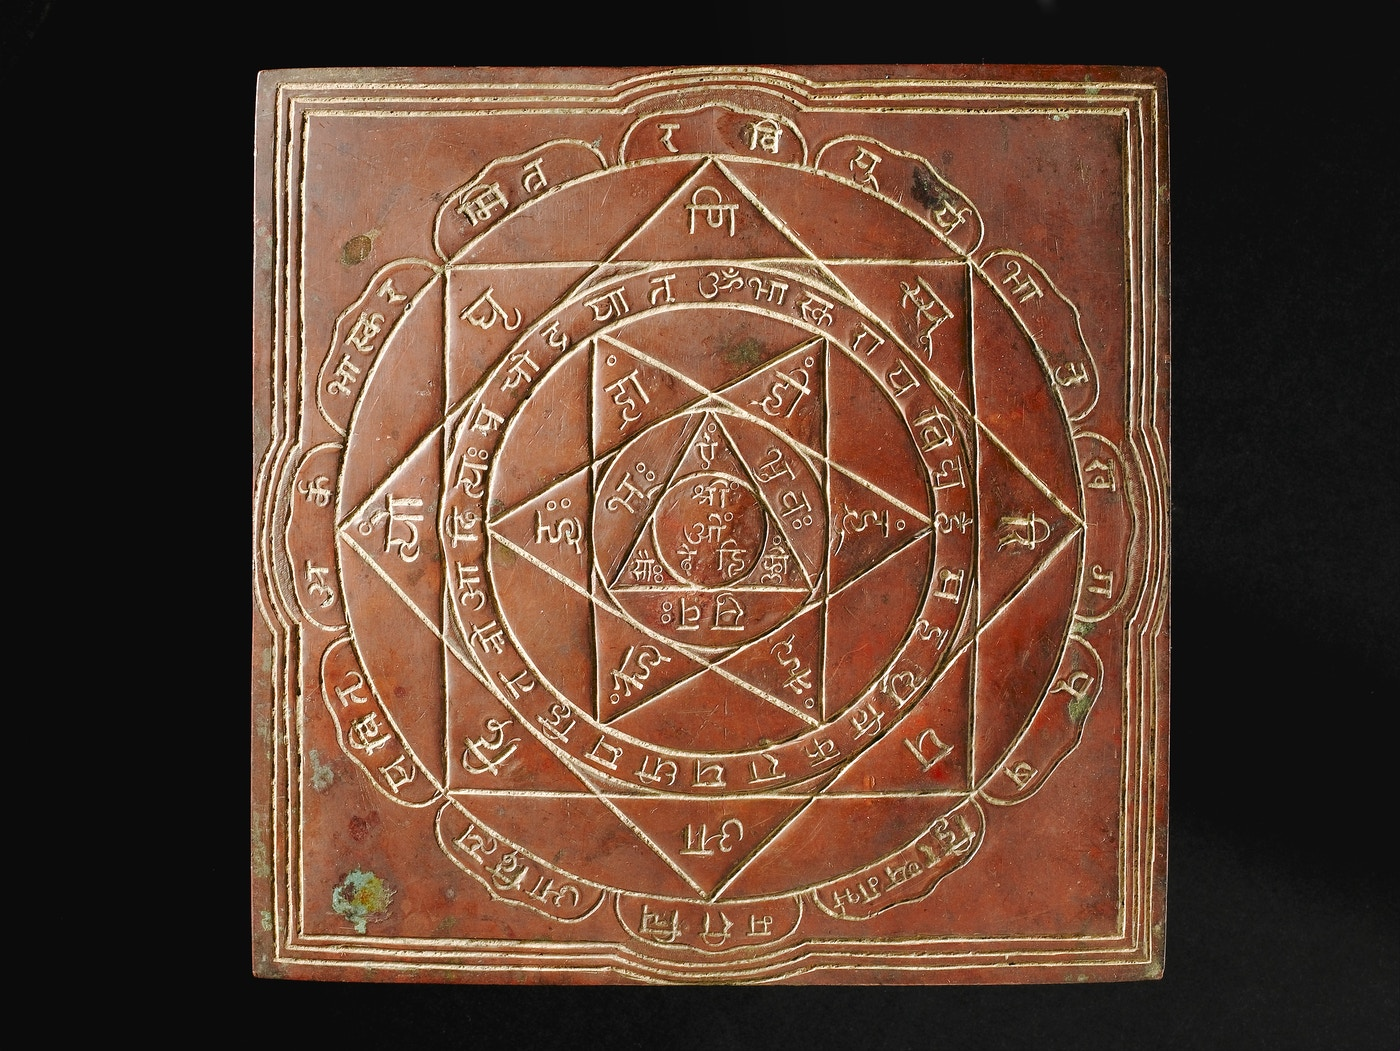 L0058517 Bronze yantra meditation plaque, India, 1801-1900